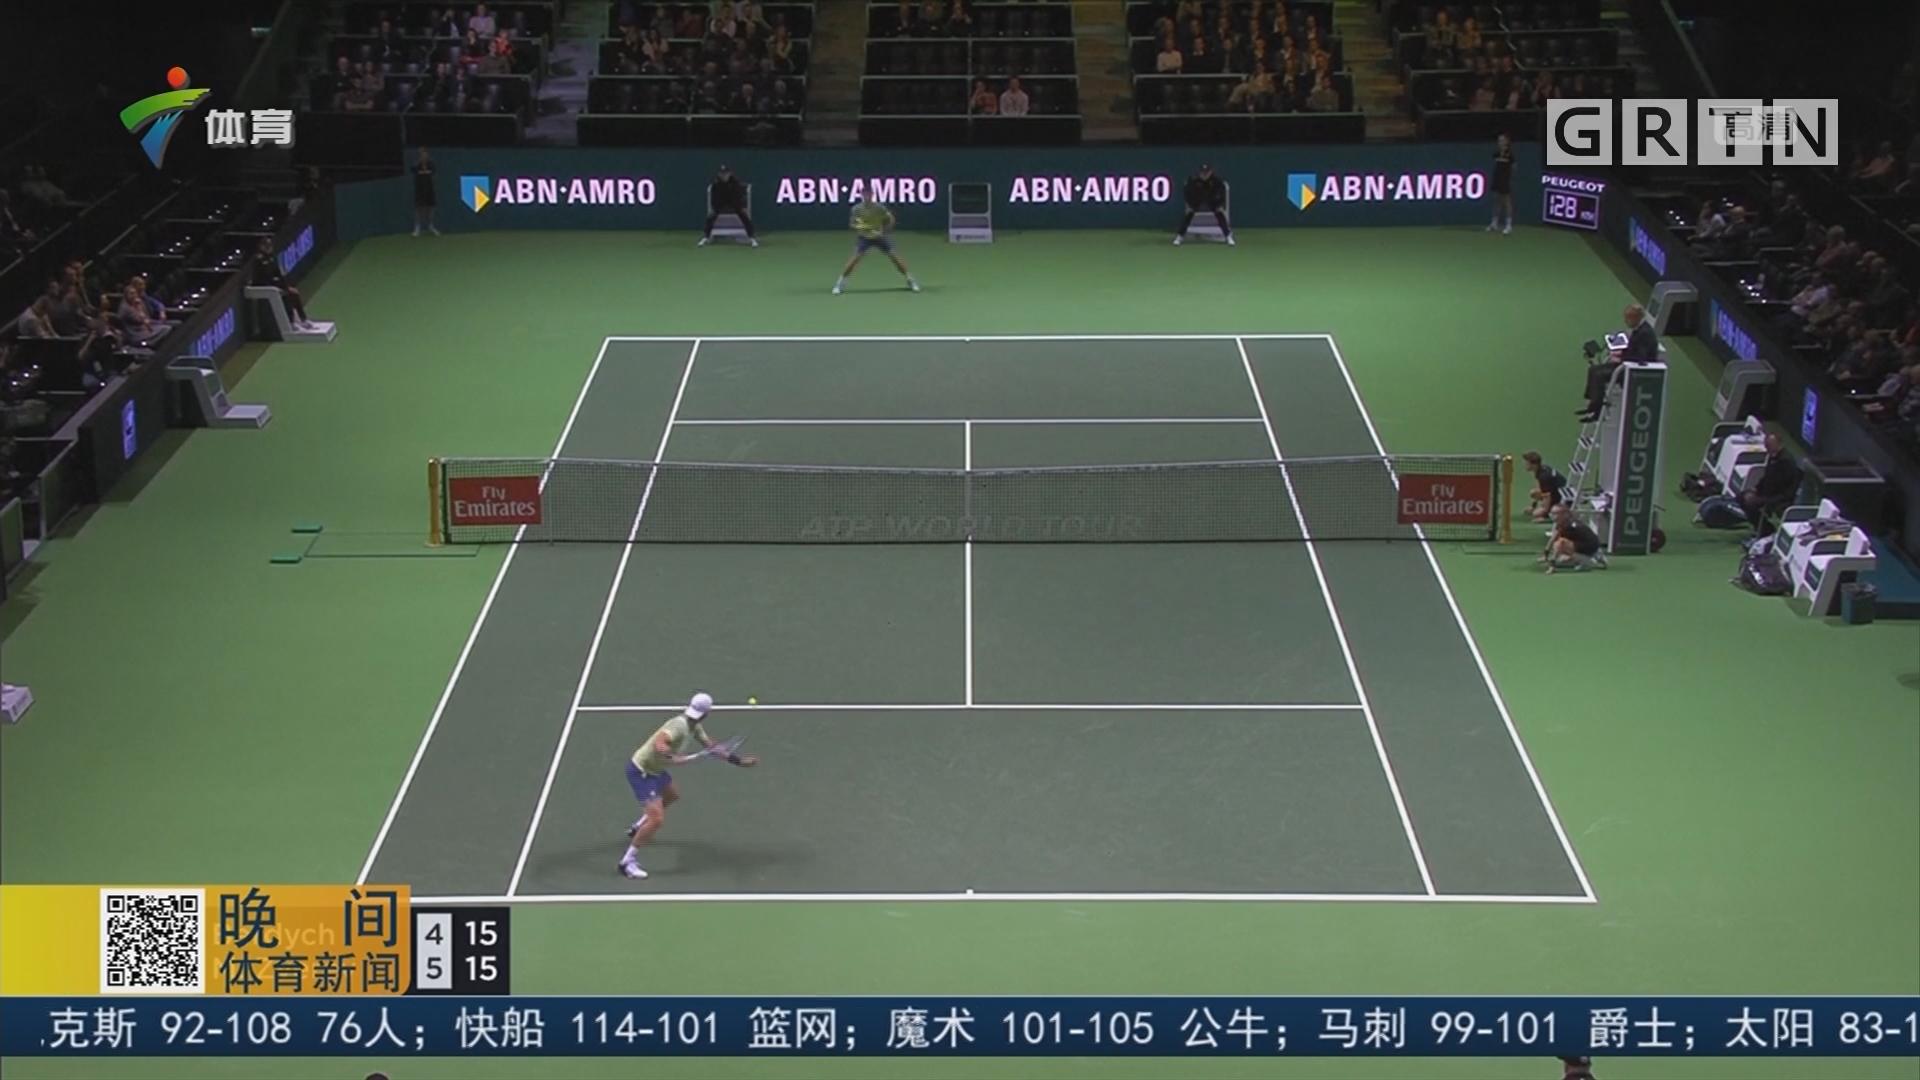 ATP鹿特丹赛 小兹维列夫、伯蒂奇晋级次轮